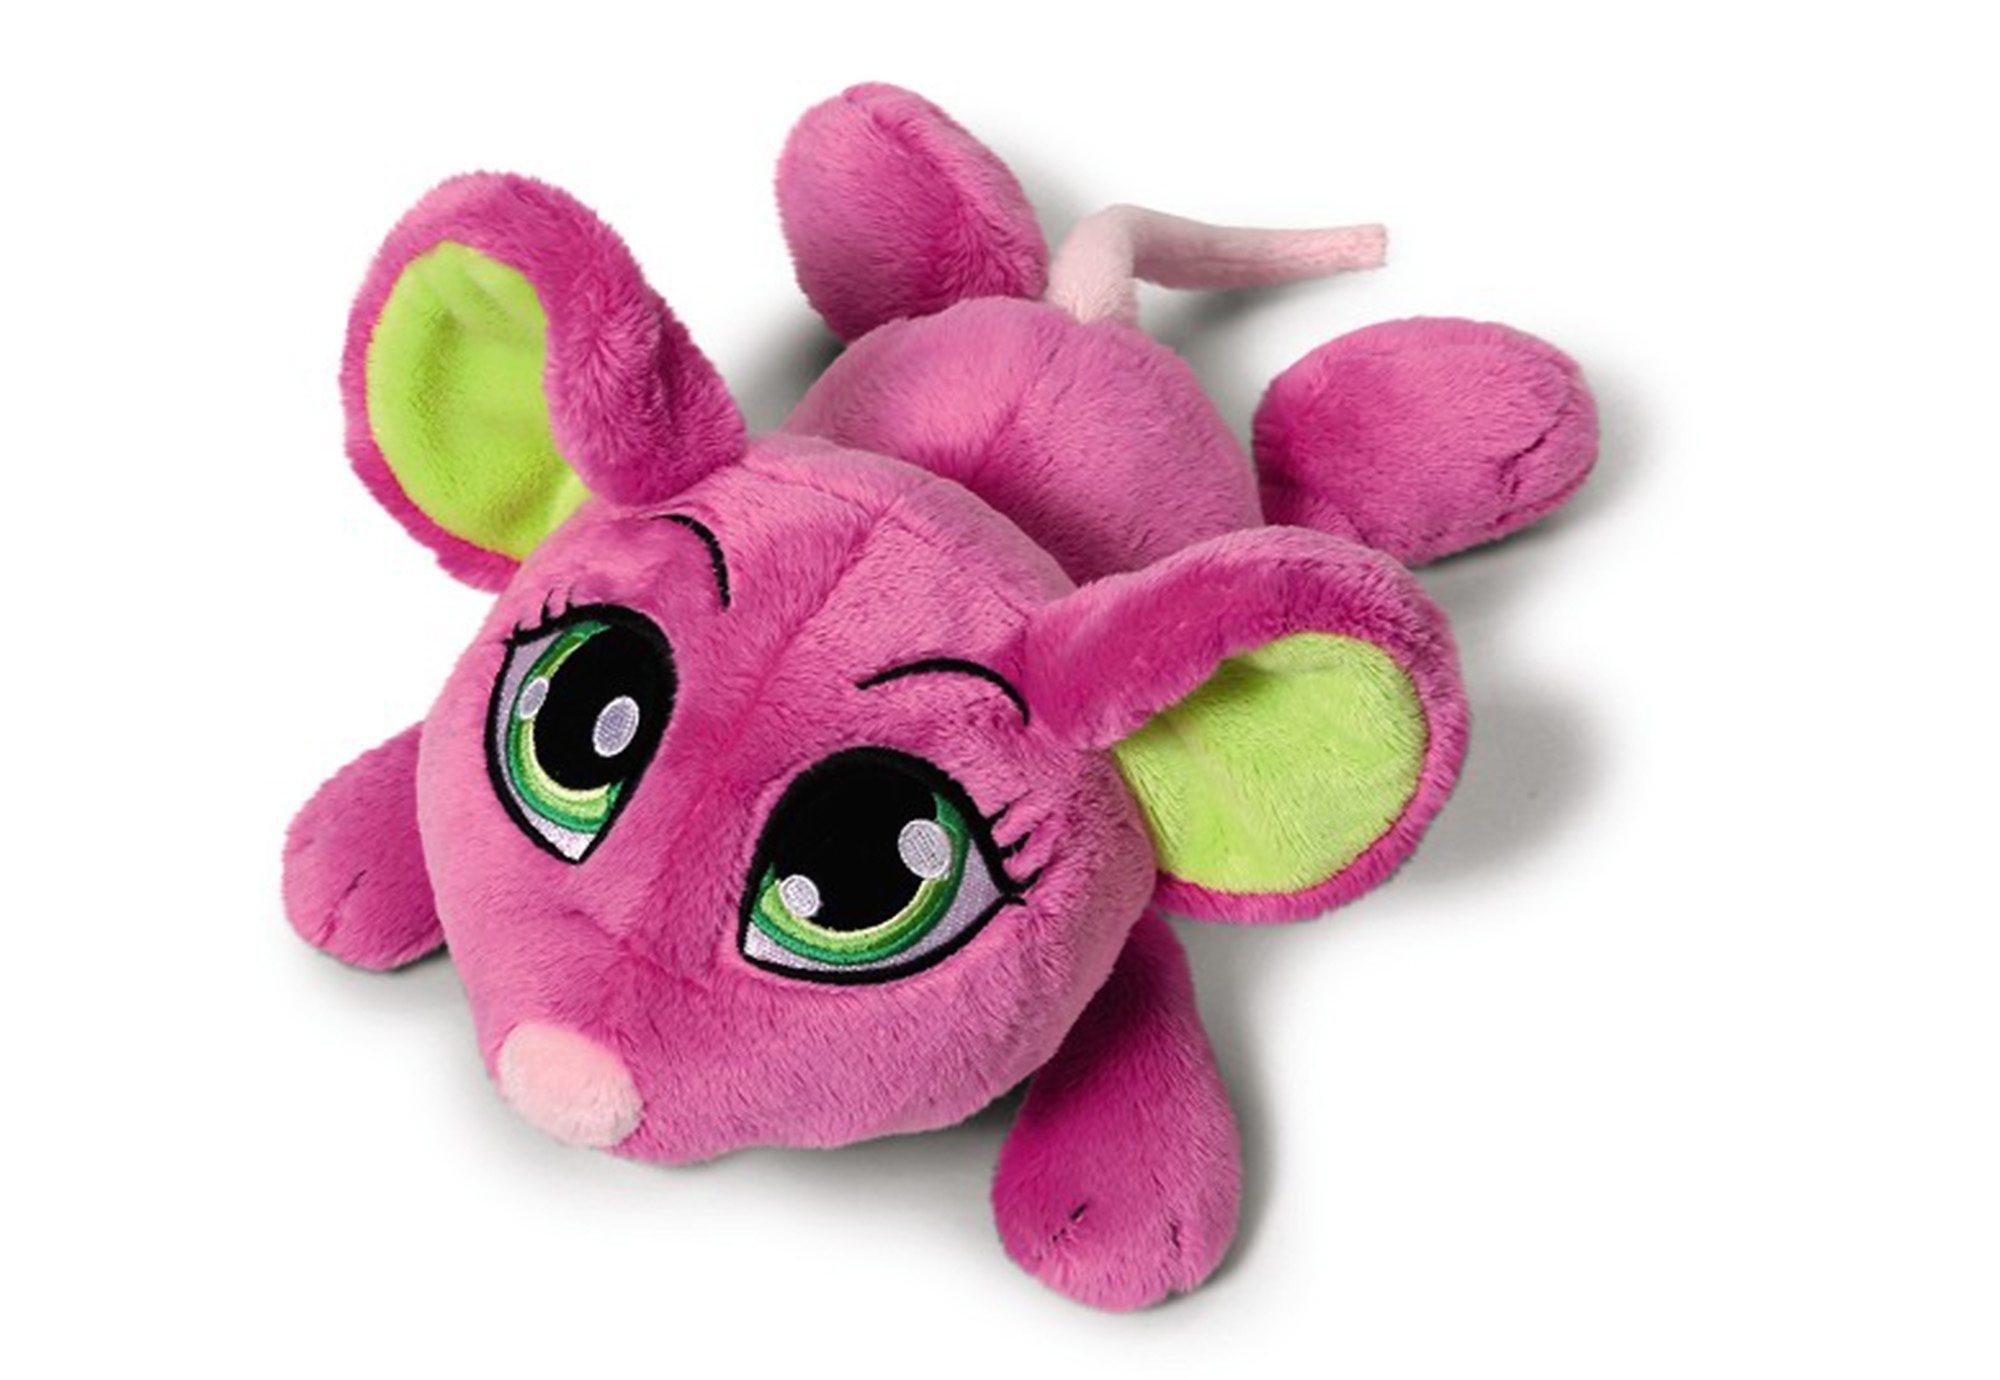 NICI Kuscheltier liegend, pink, »Sweethearts 4 - Maus«